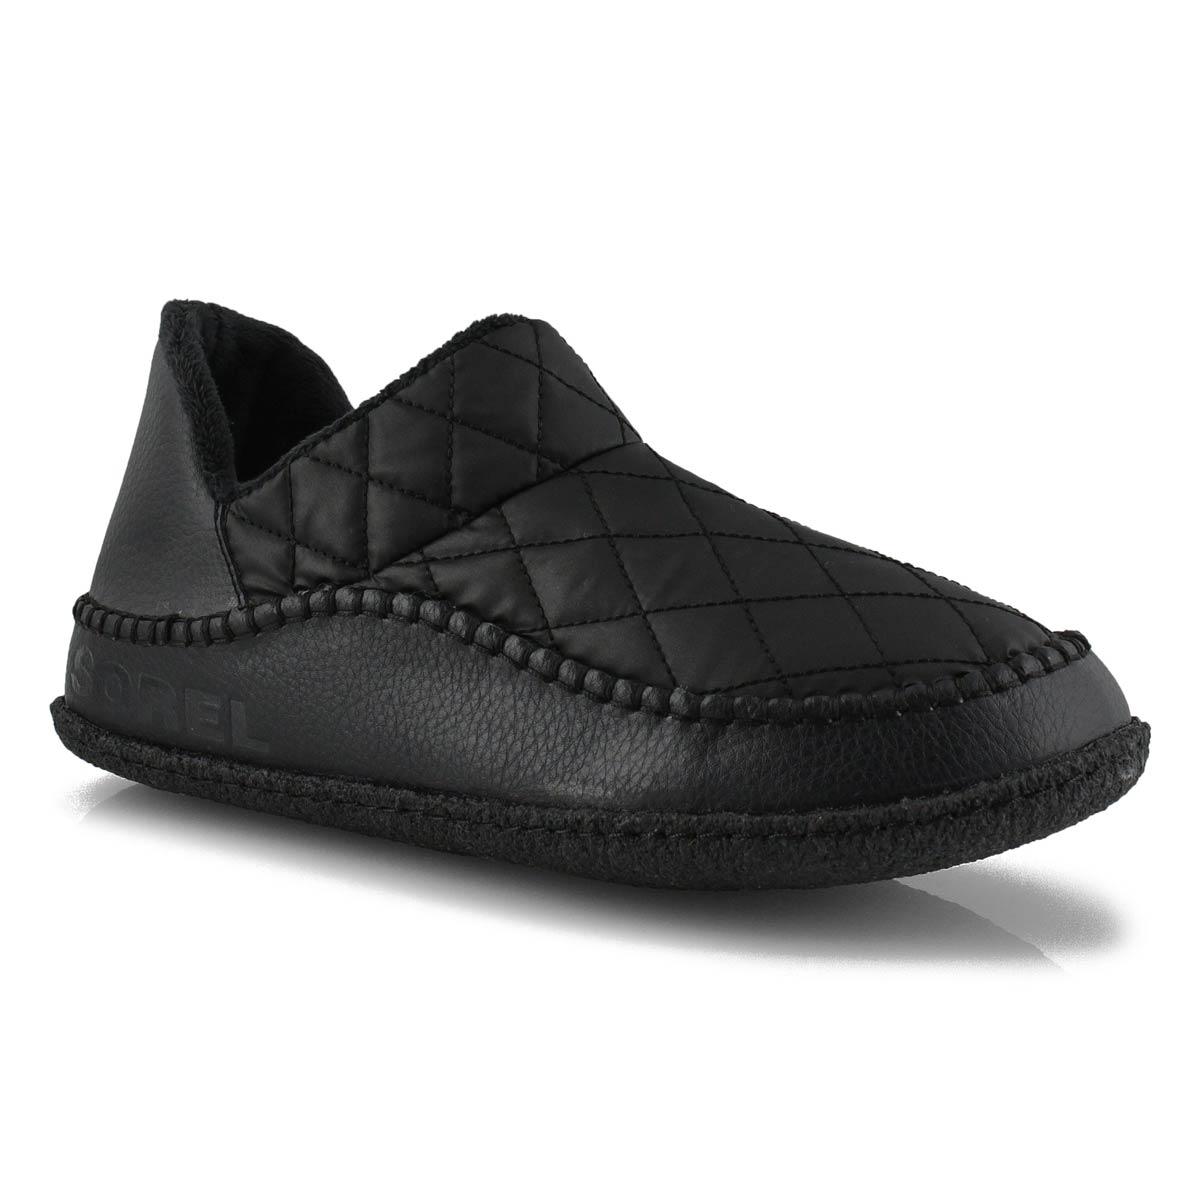 Men's Manawan II Slipper - Black